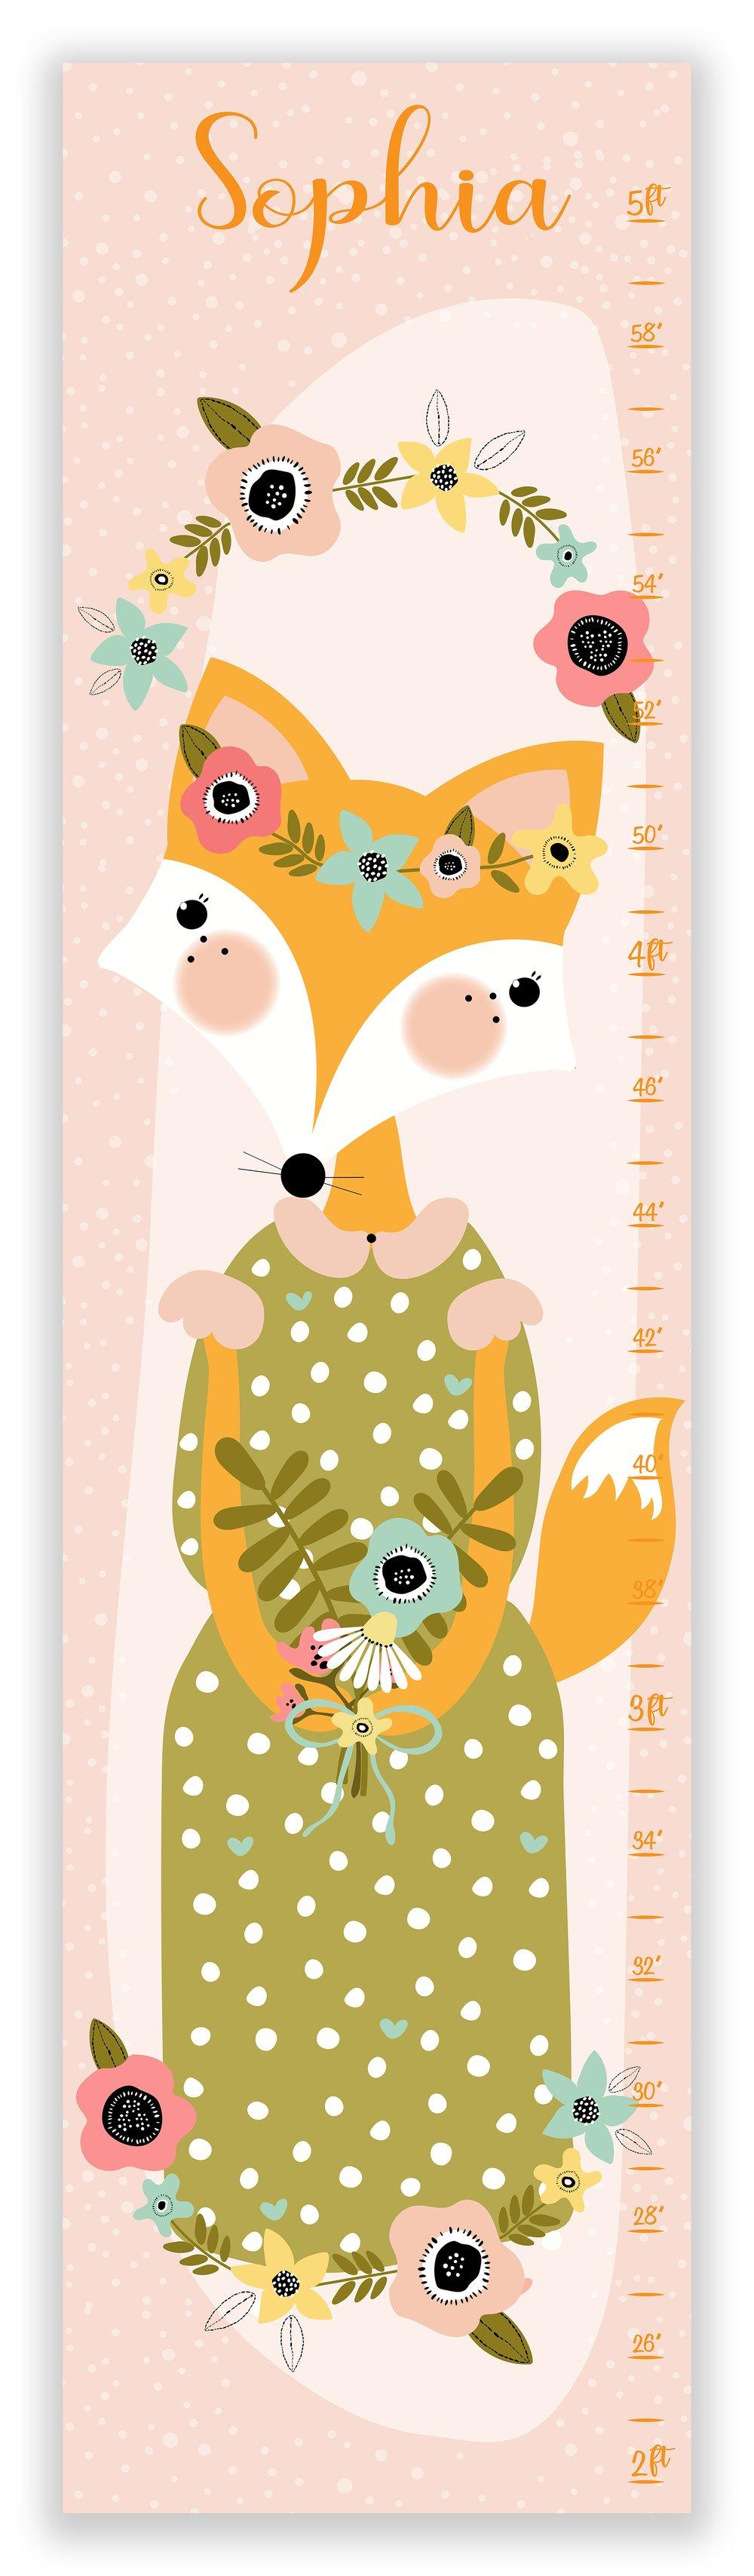 Image of Sweet Boho Vintage Woodland Fox - Personalized Canvas Growth Chart